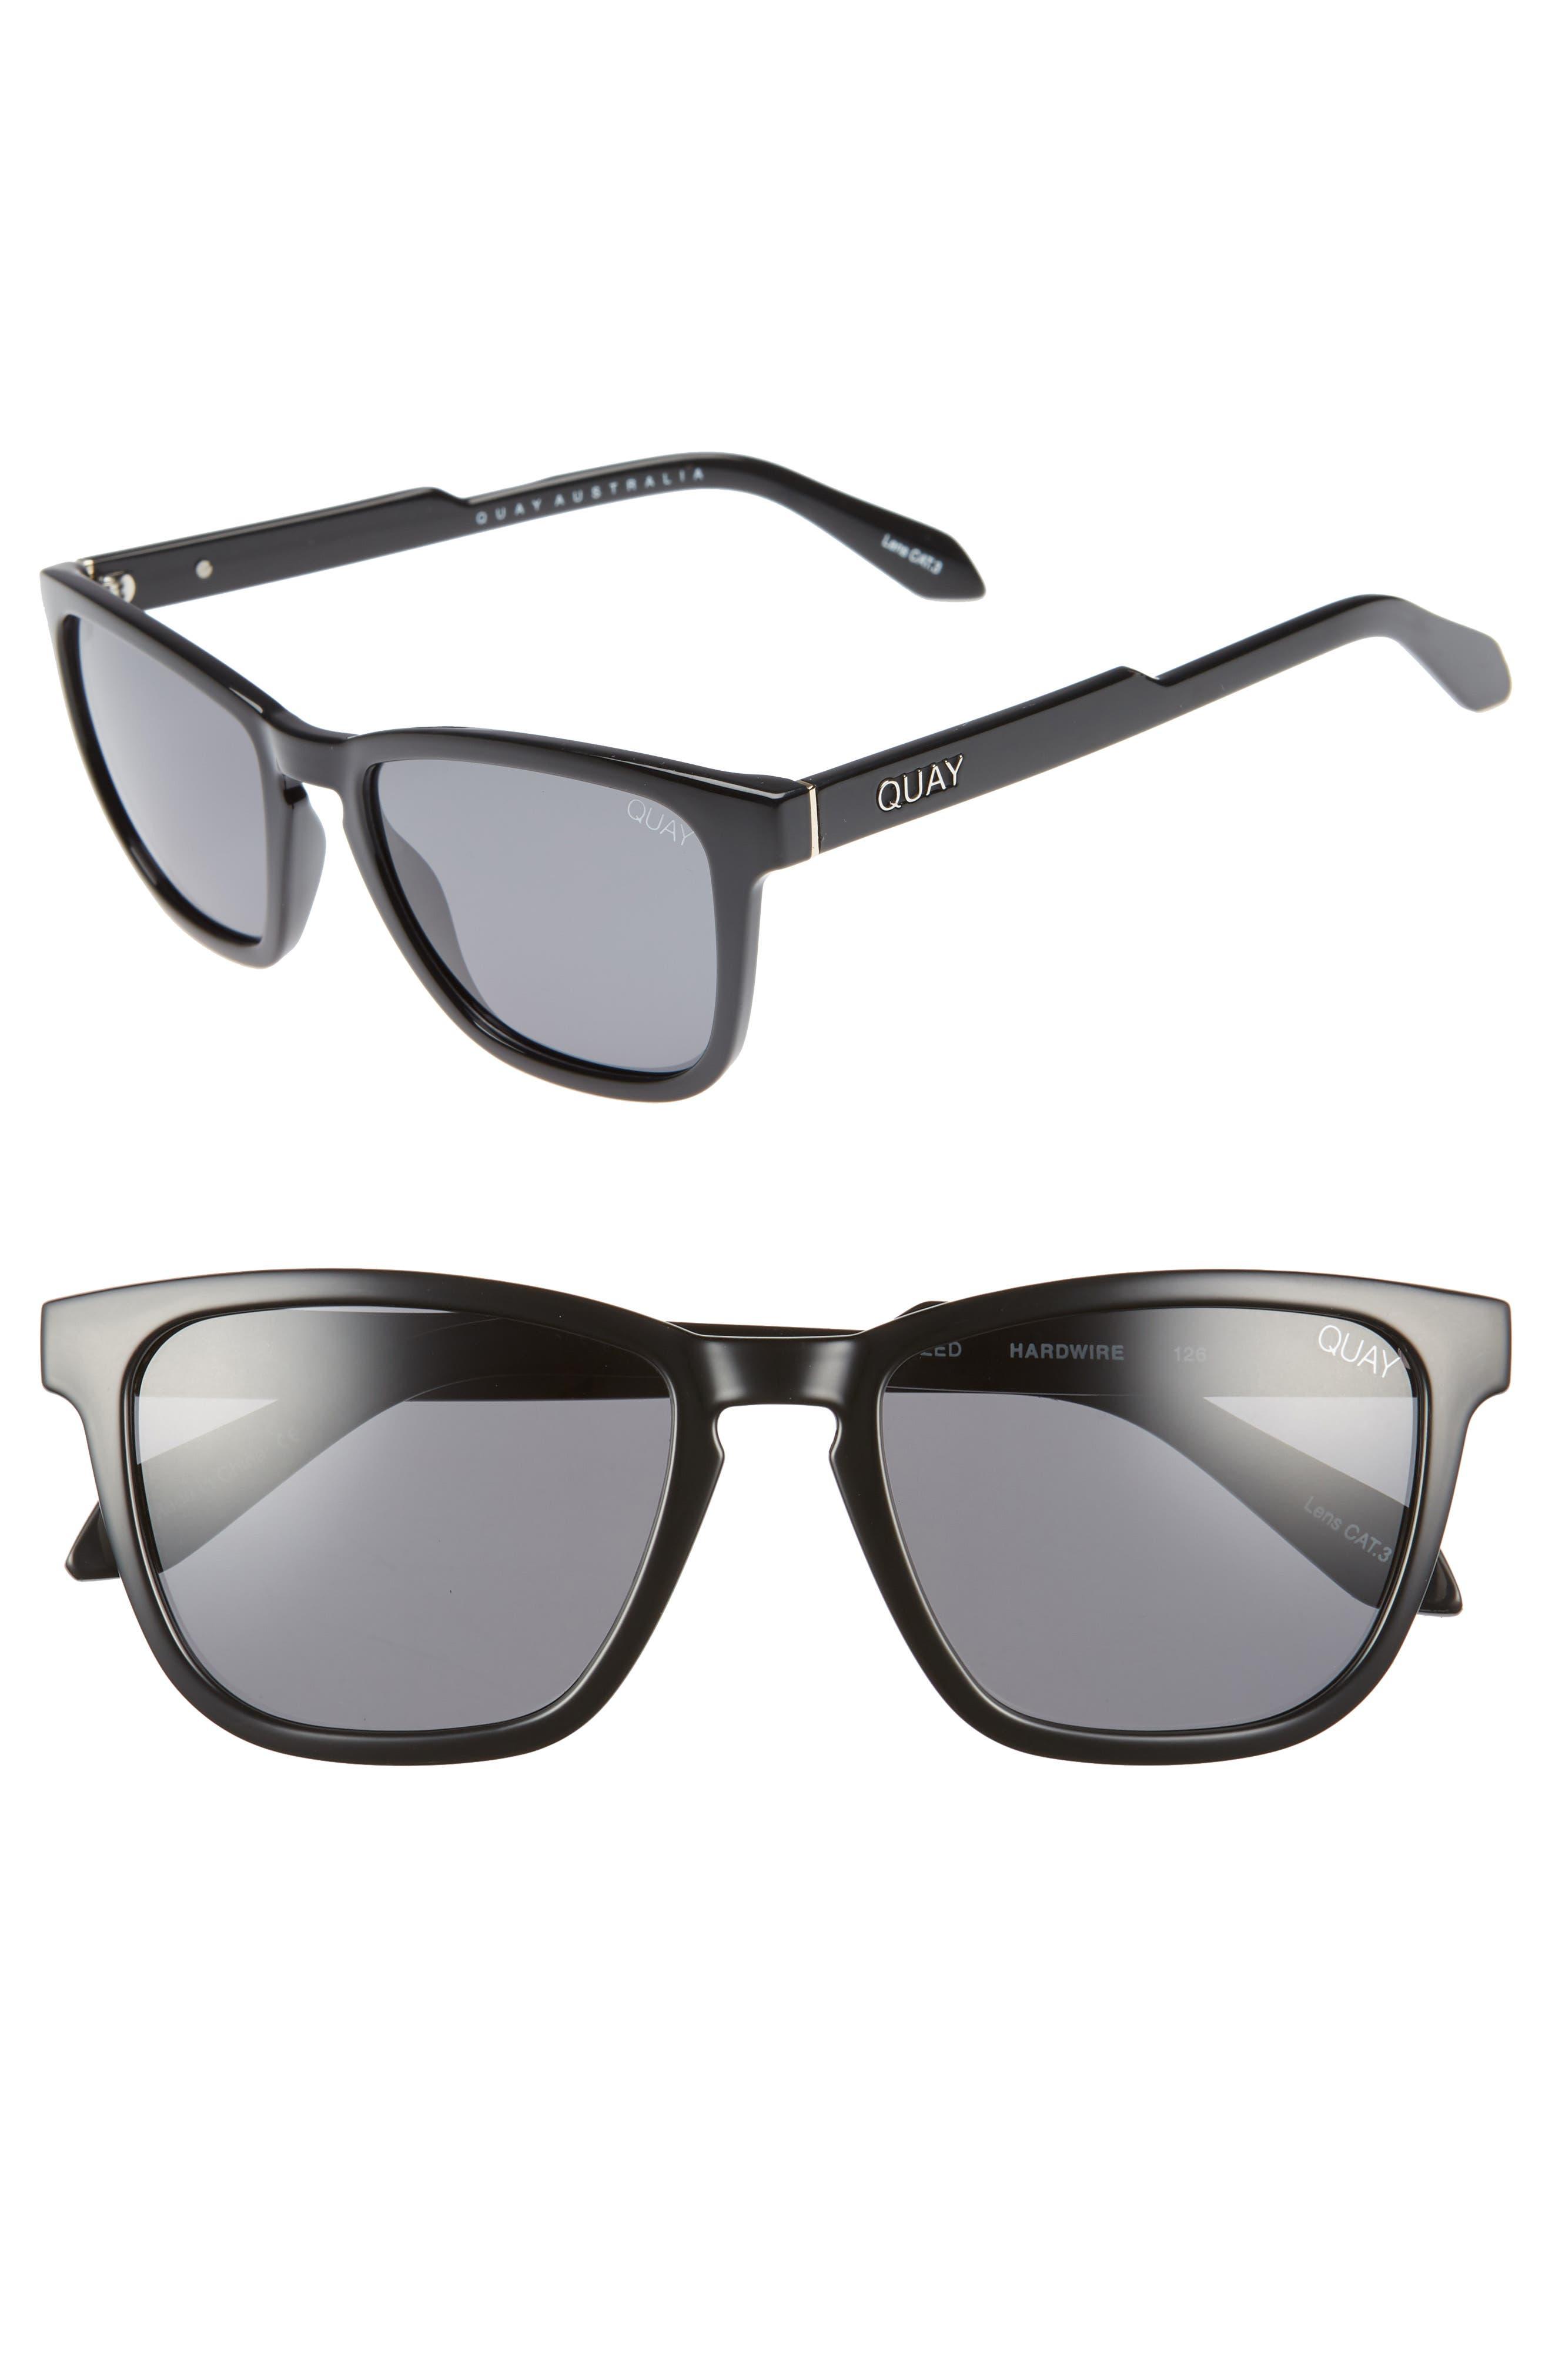 Hardwire 54mm Polarized Sunglasses,                         Main,                         color, BLACK/ SMOKE LENS